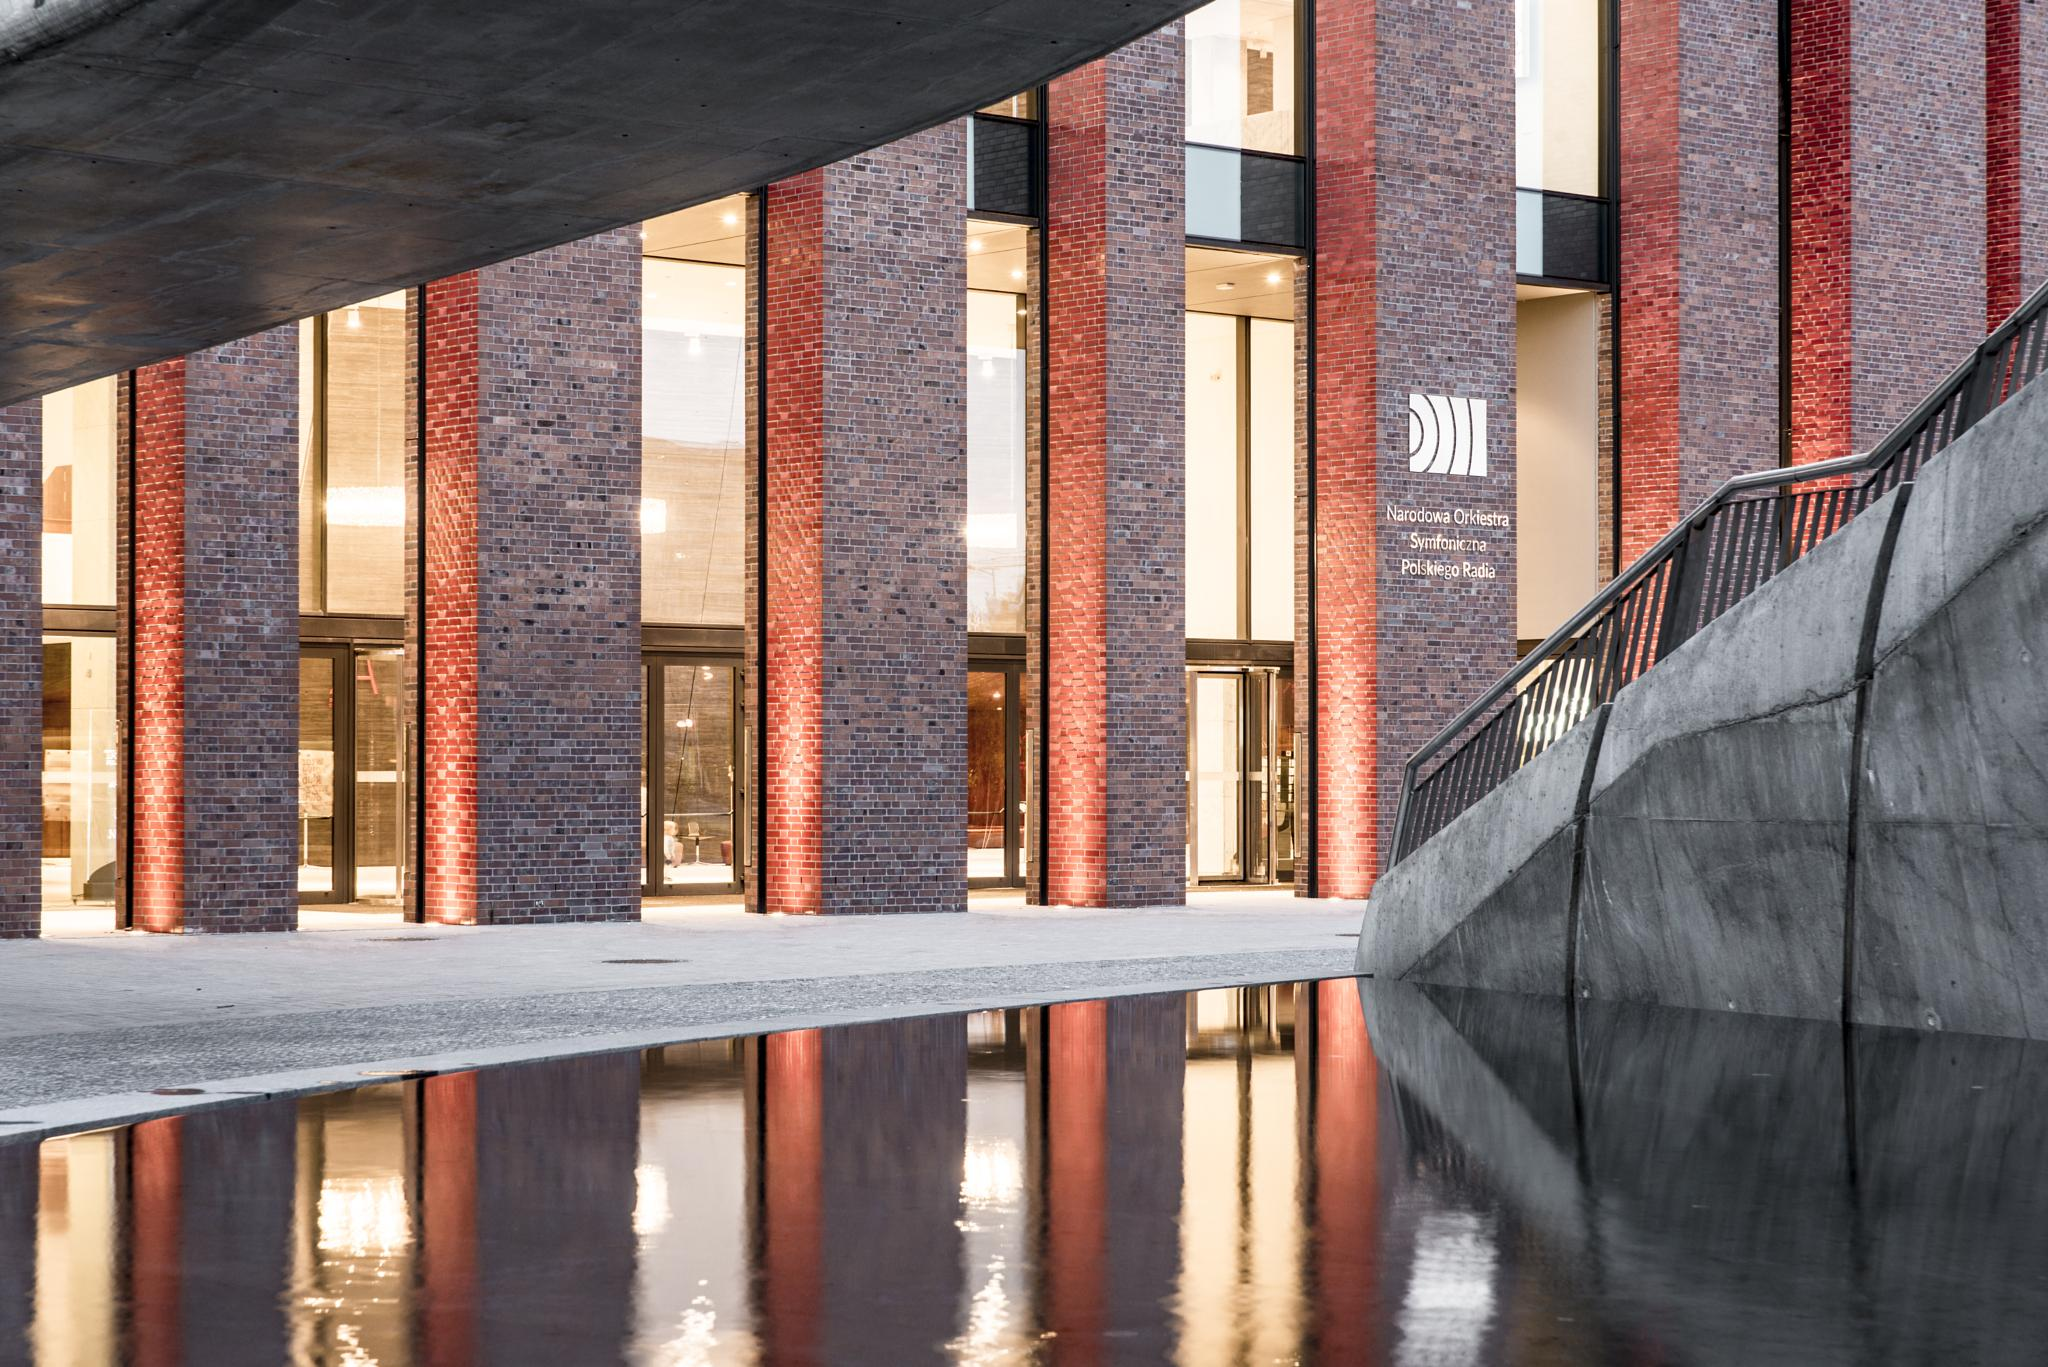 Polish National Radio Symphony Orchestra building by BD